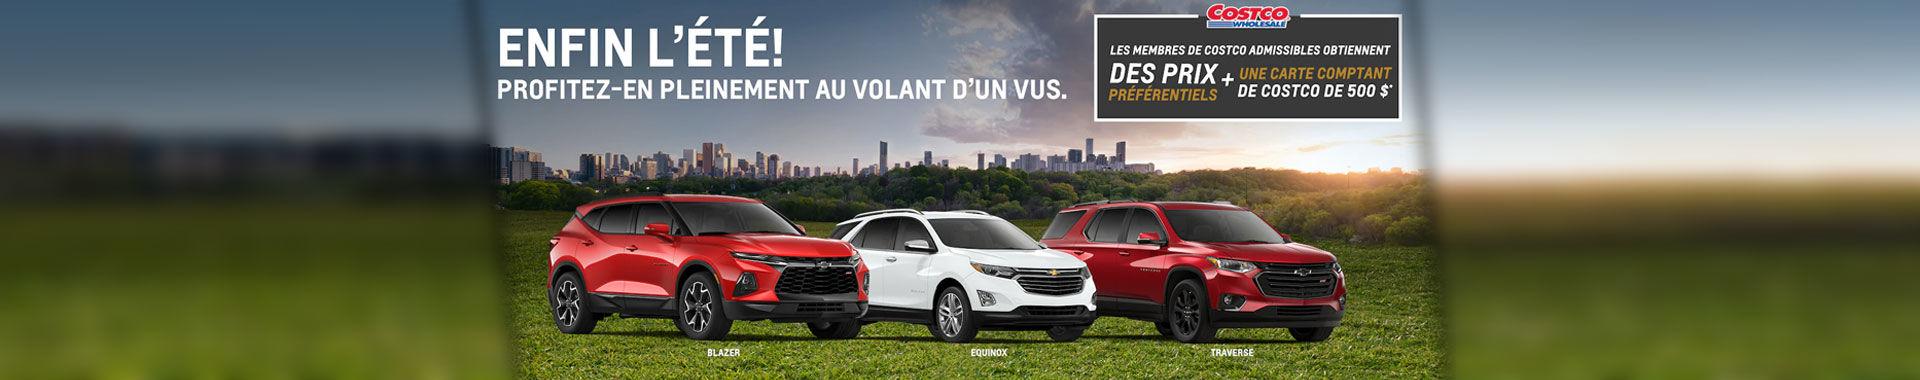 Juillet -2019 - SUV